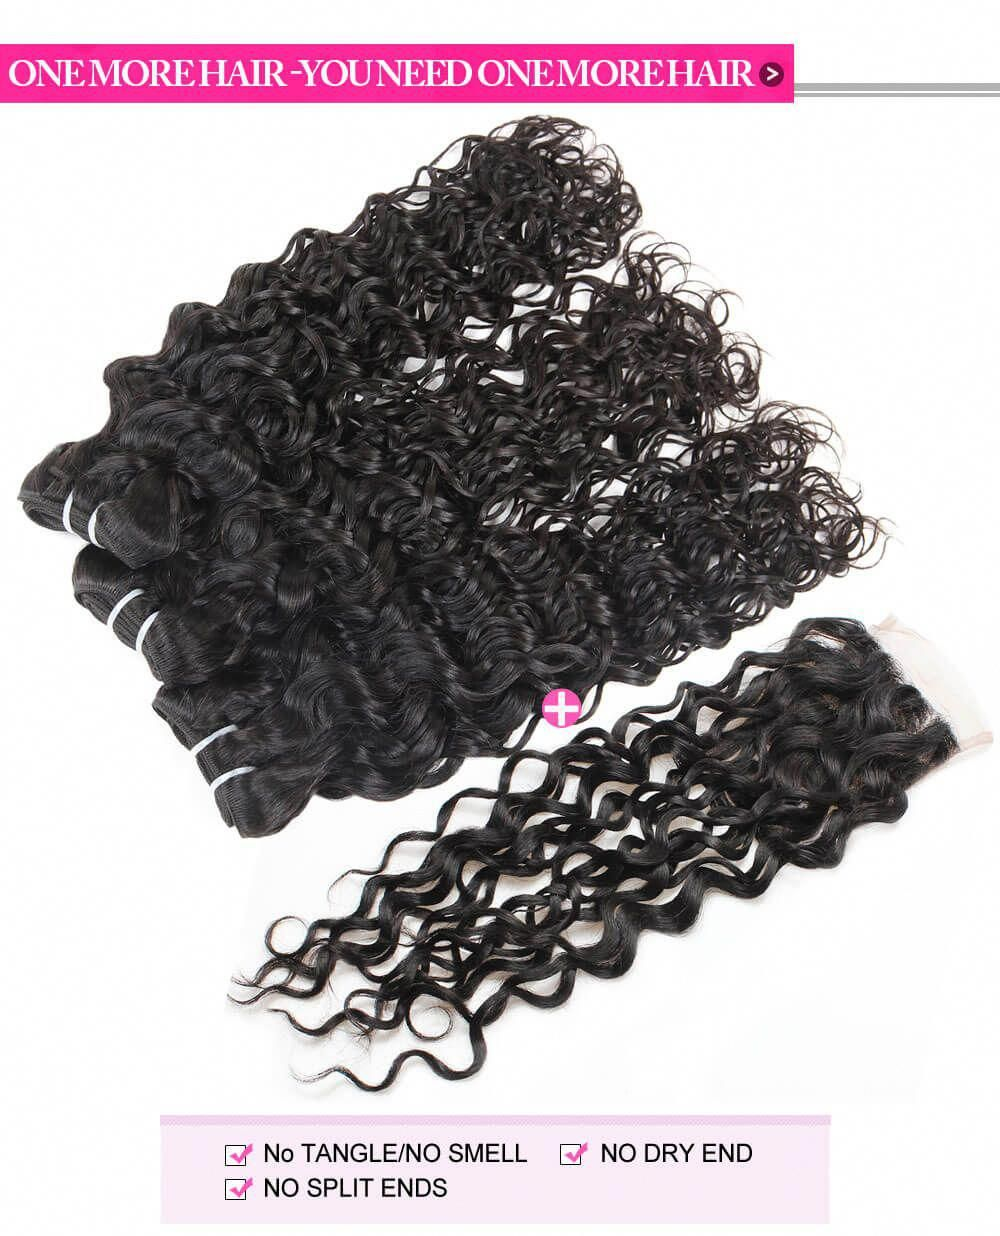 Malaysian virgin remy hair sew ins water wave hair weave bundles